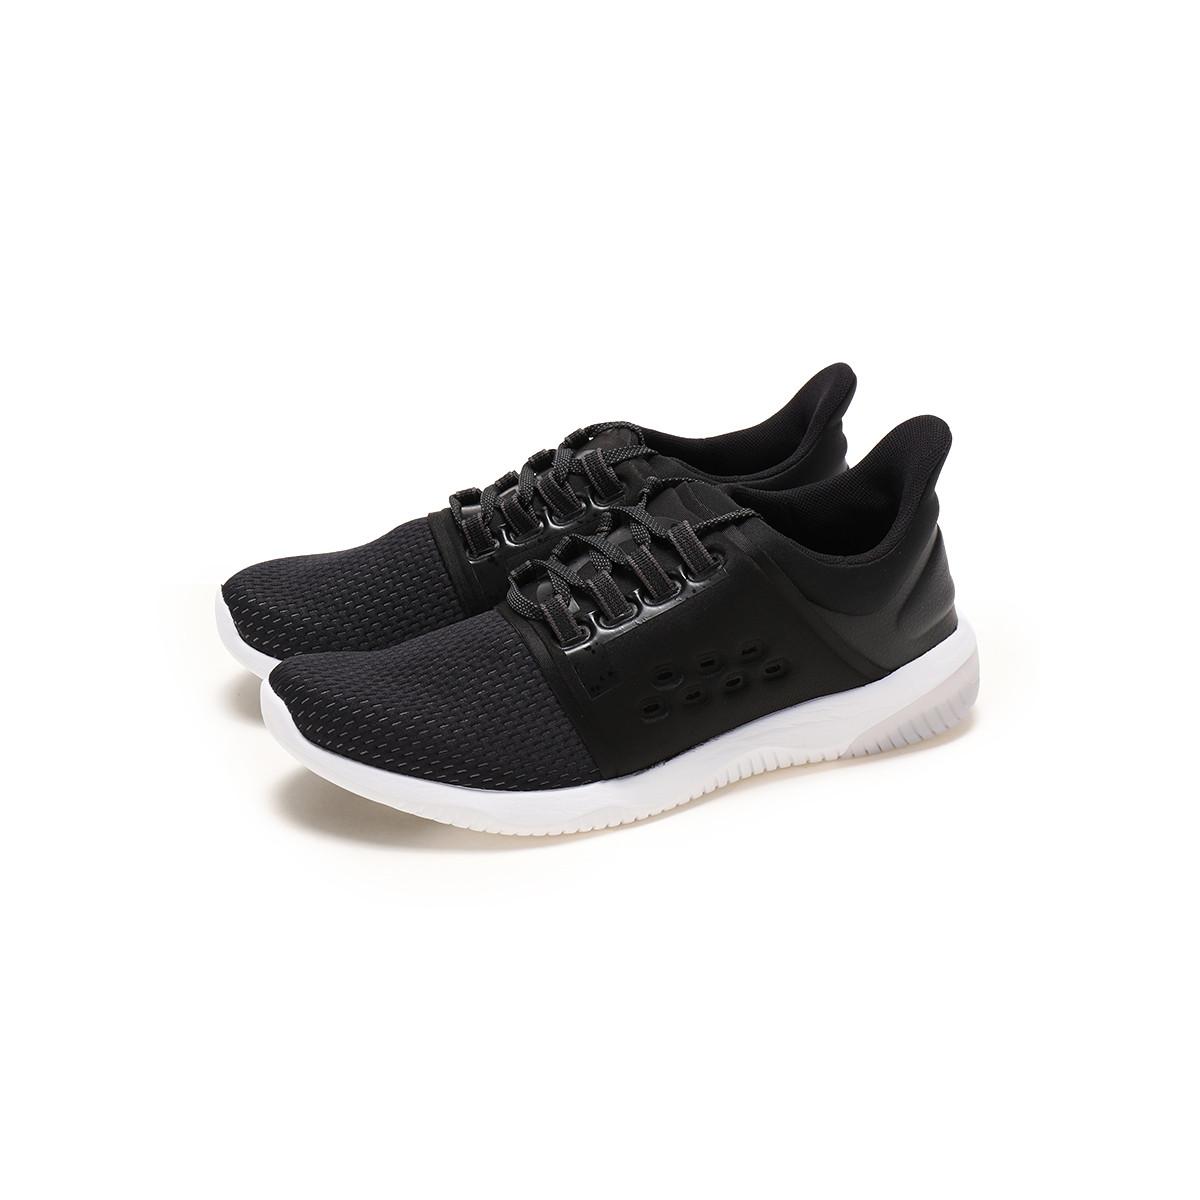 ASICS 亚瑟士 CLASSIC TEMPO 男女款运动鞋 *2件